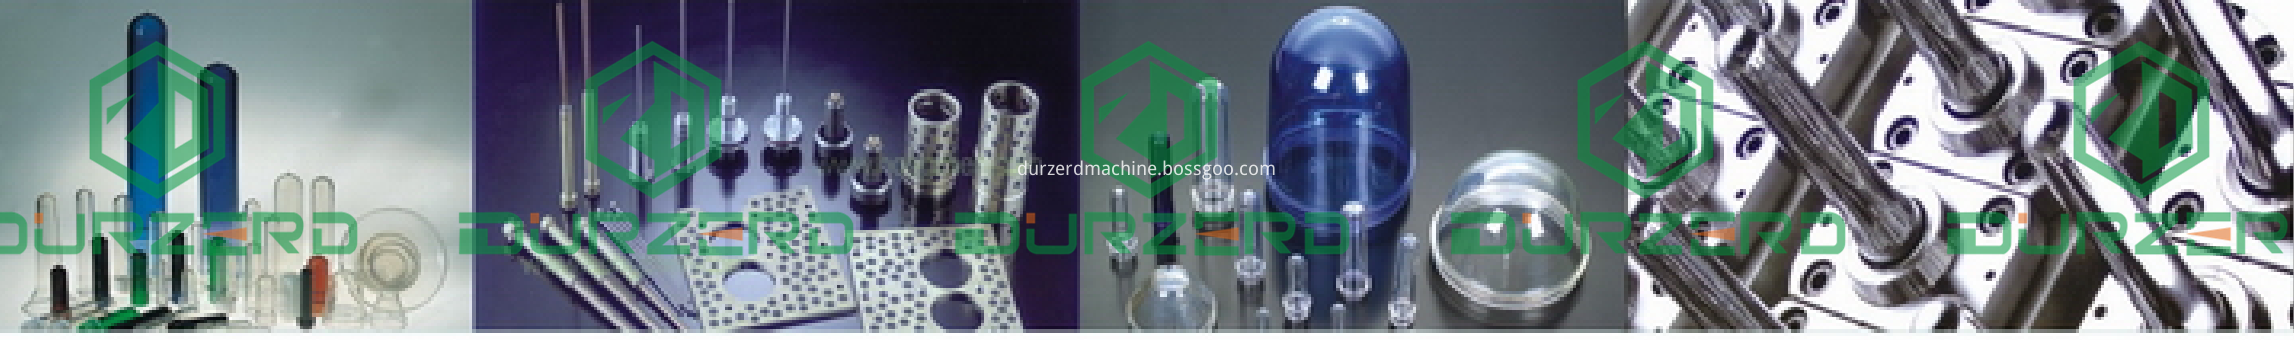 injection machine price